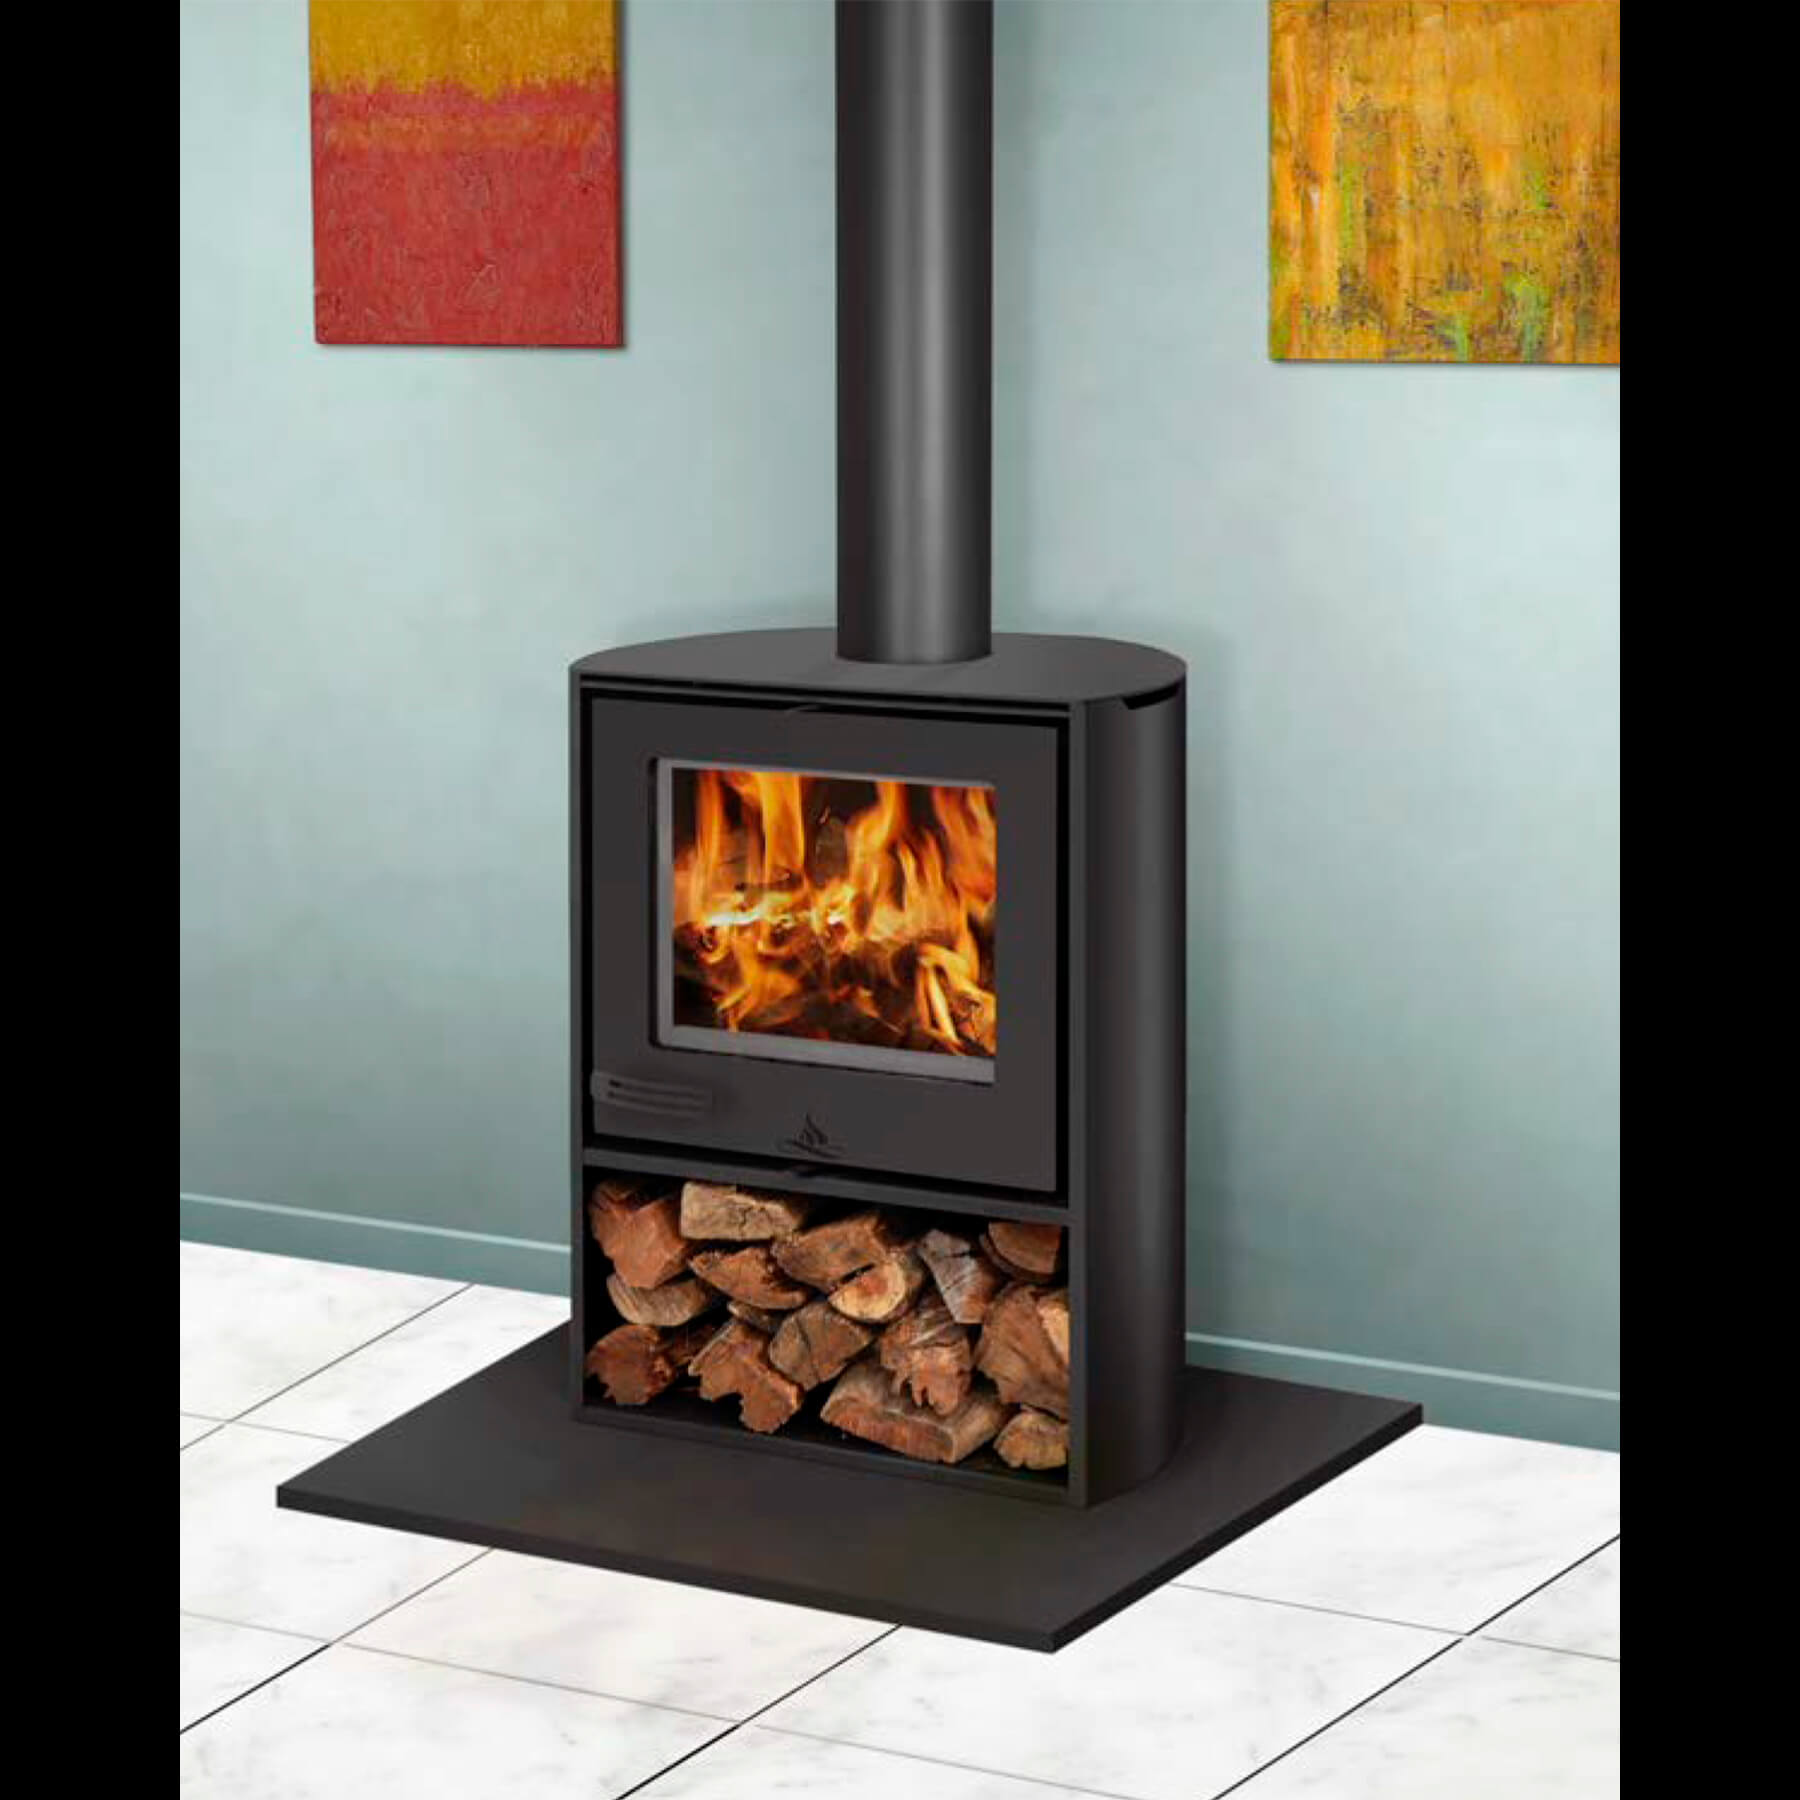 Combustion-Fireplaces-Freestanding-10kw-Curve-Convection-Unit